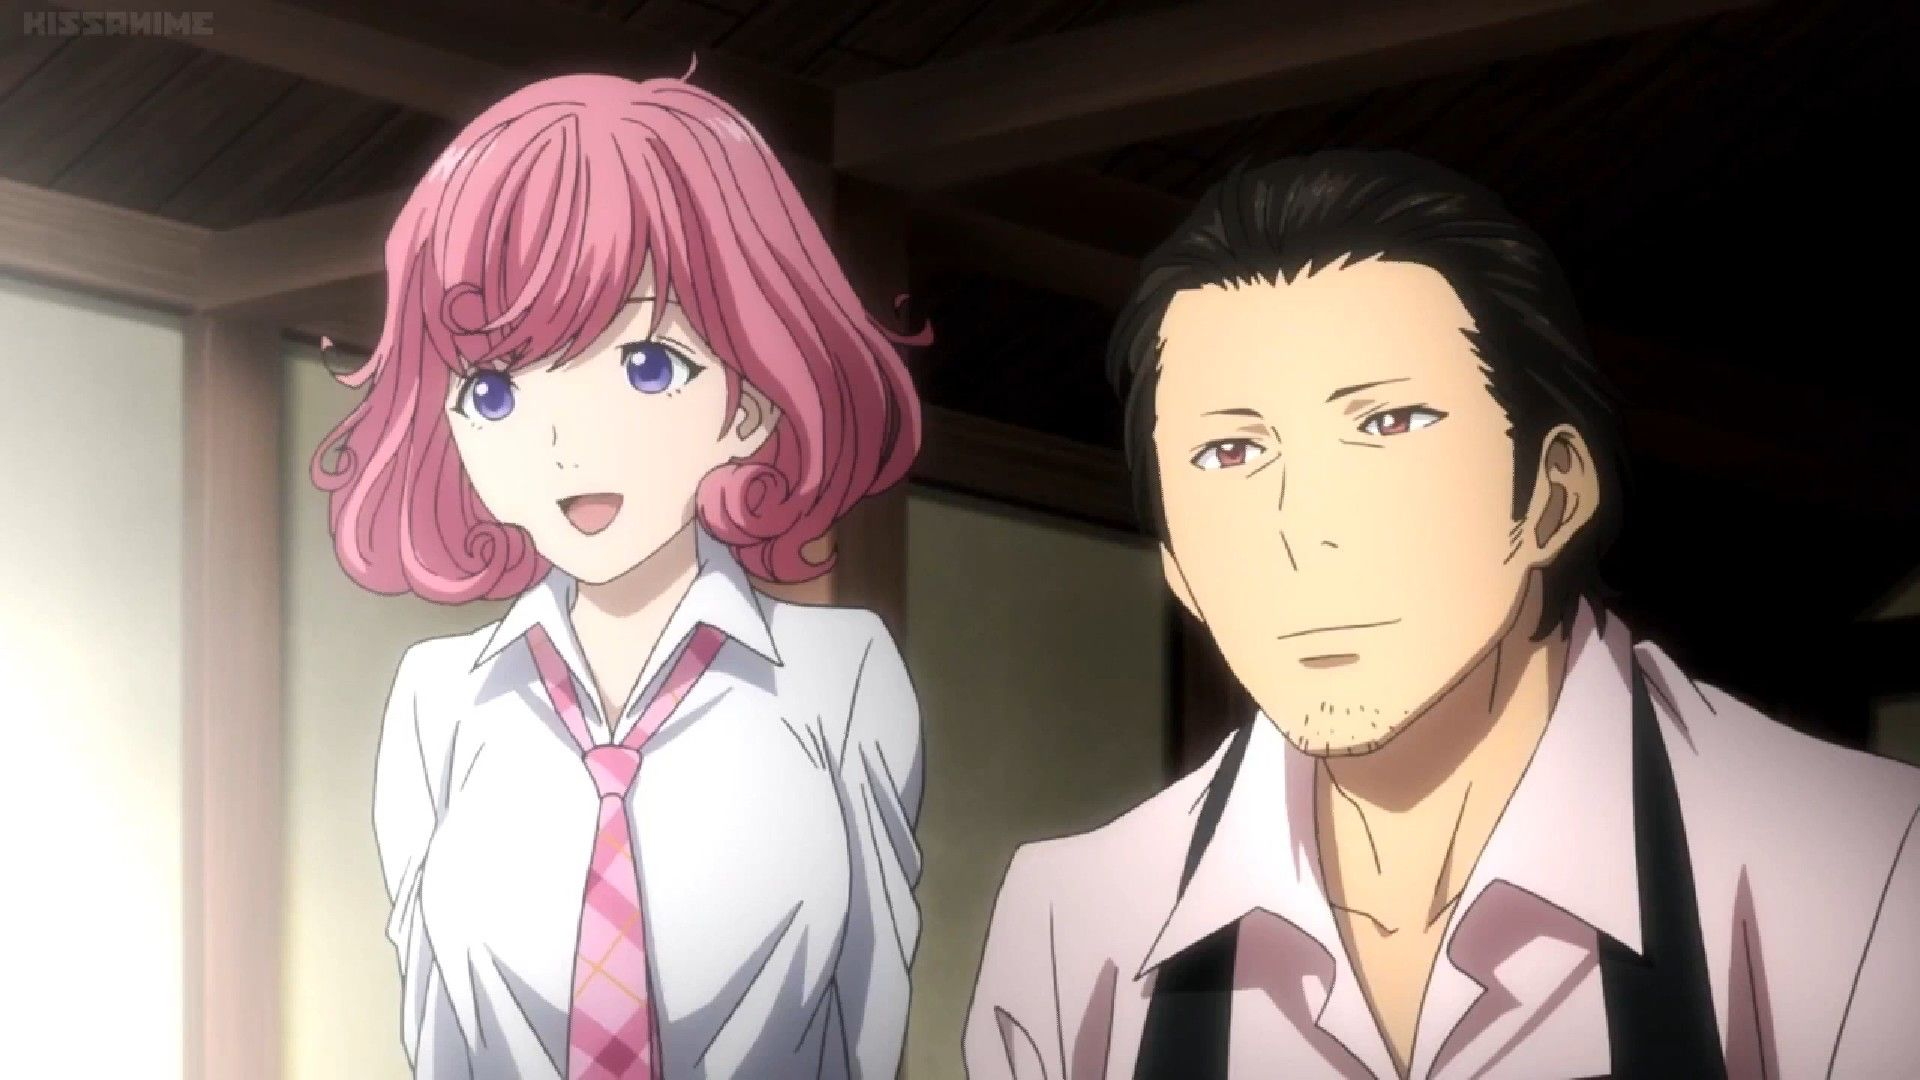 Pin on Anime 1